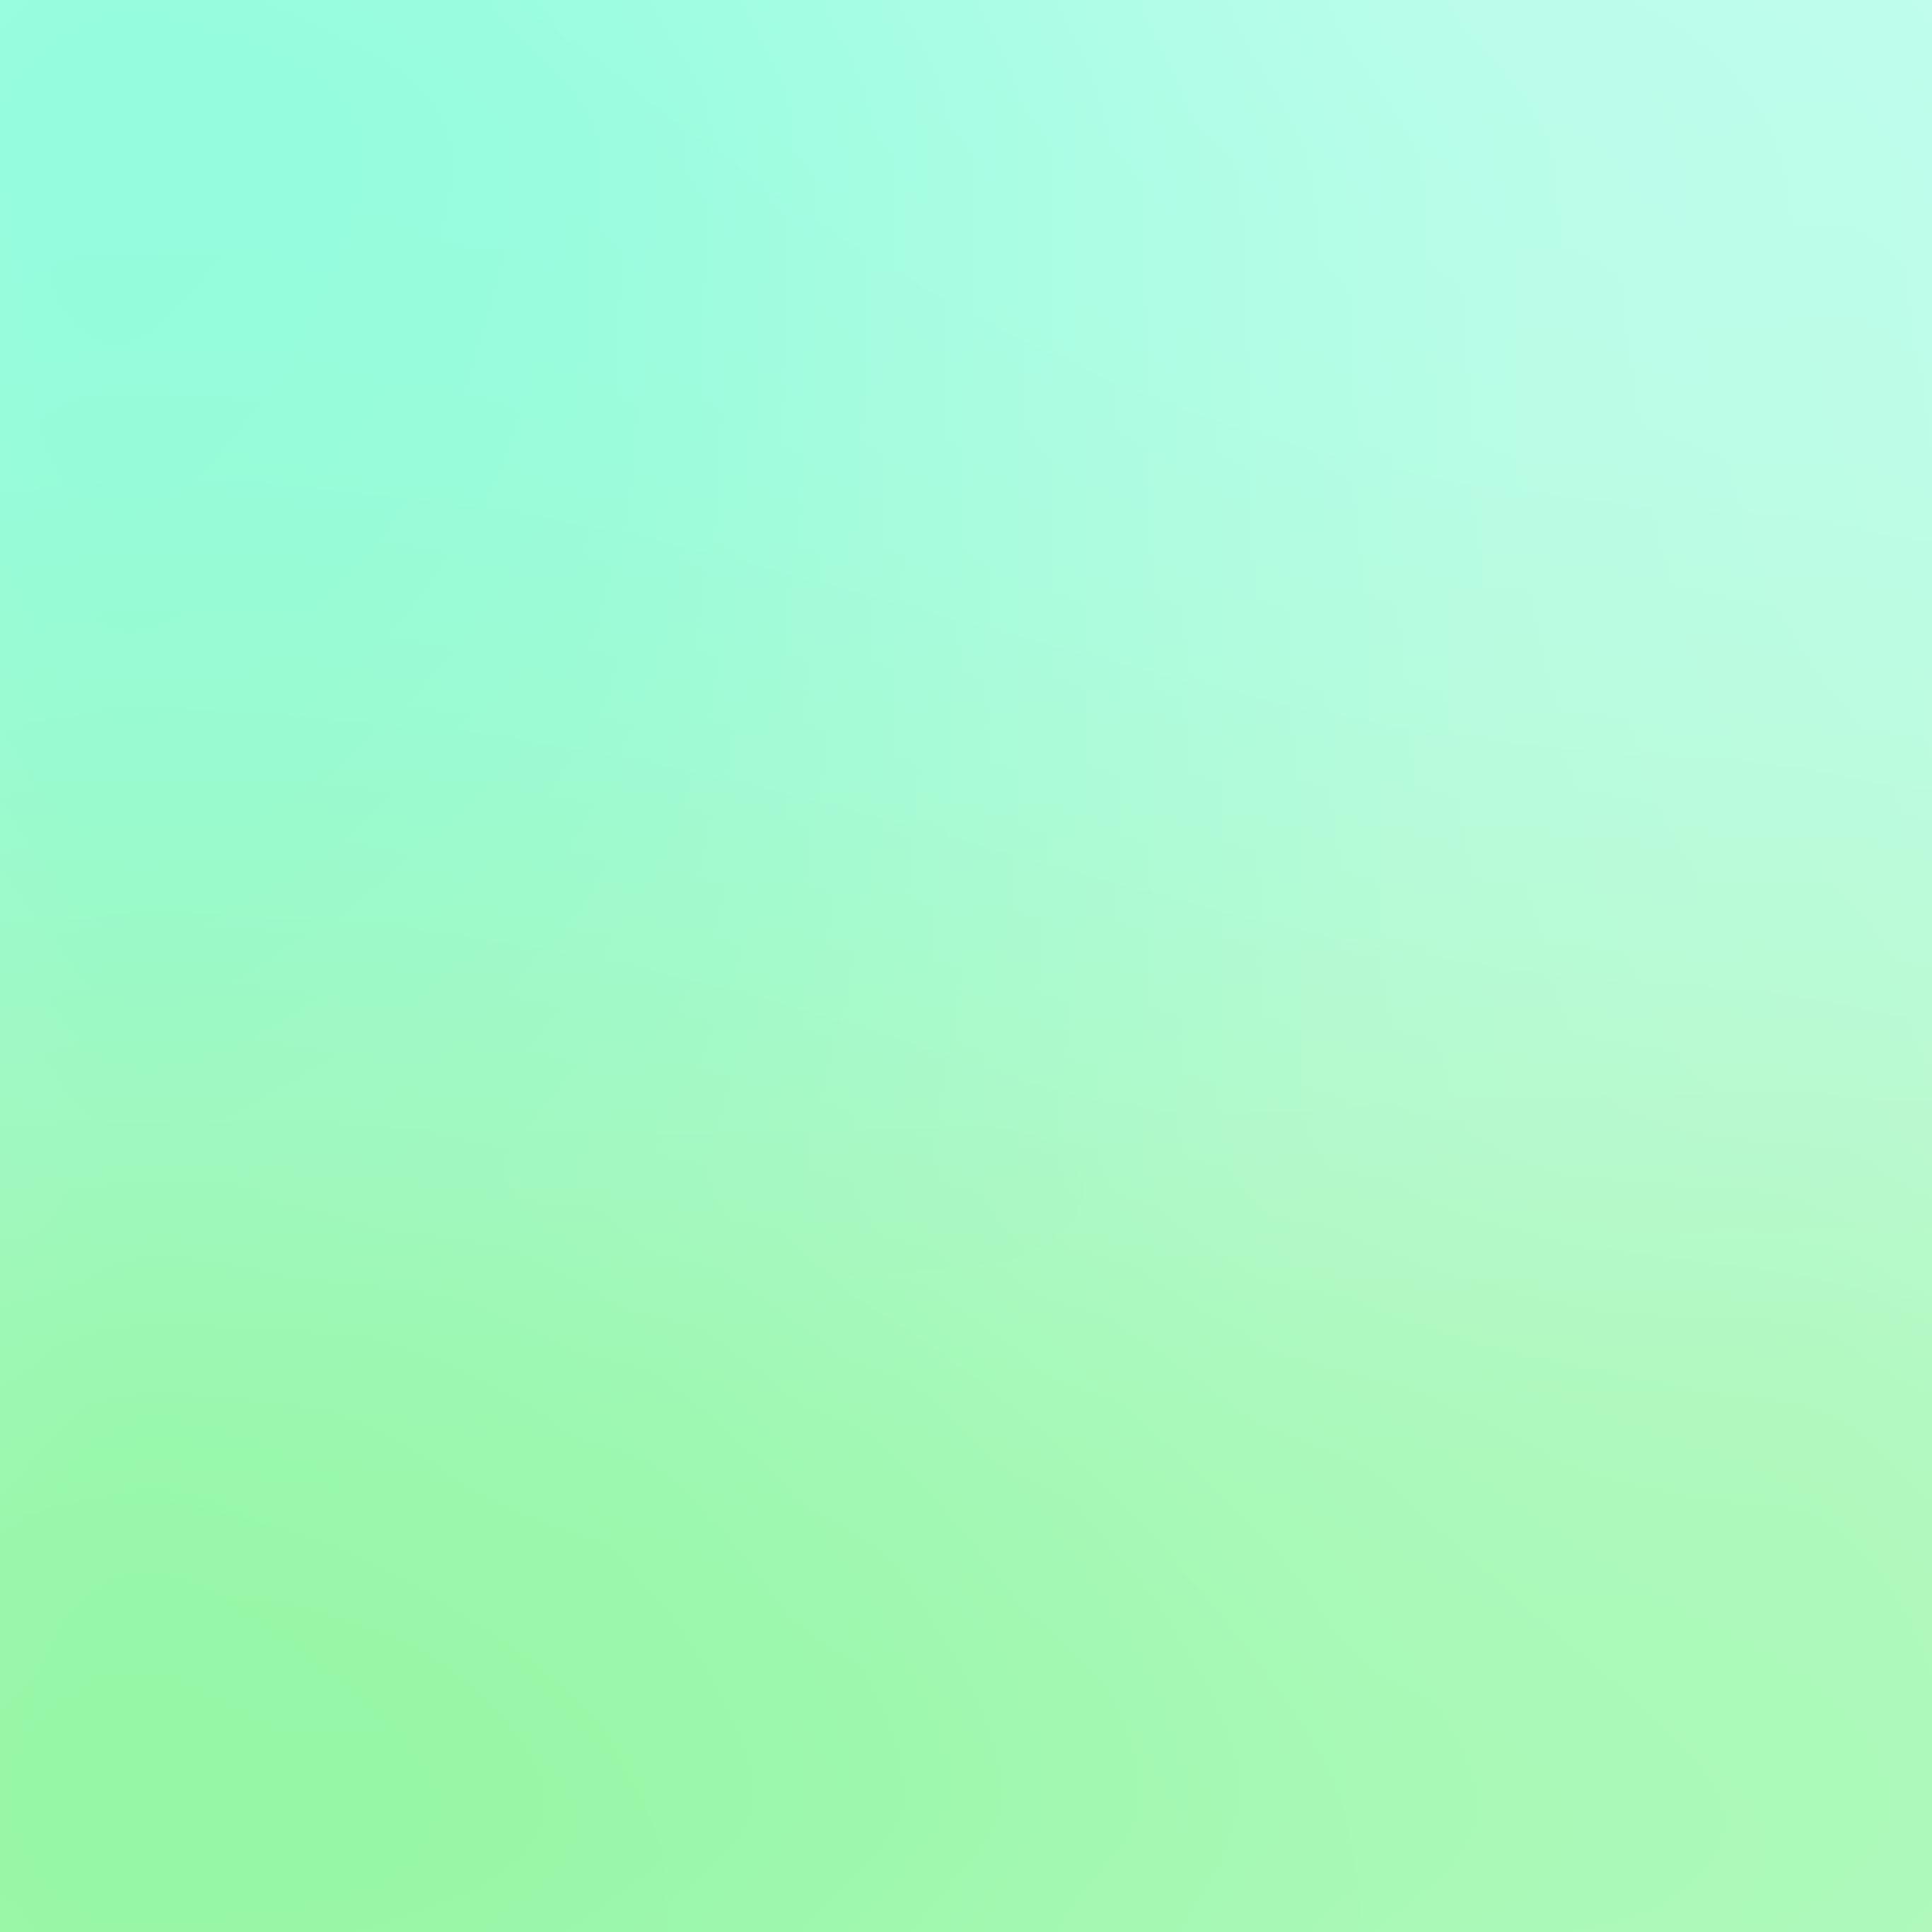 Pastel Mint Green Background ...